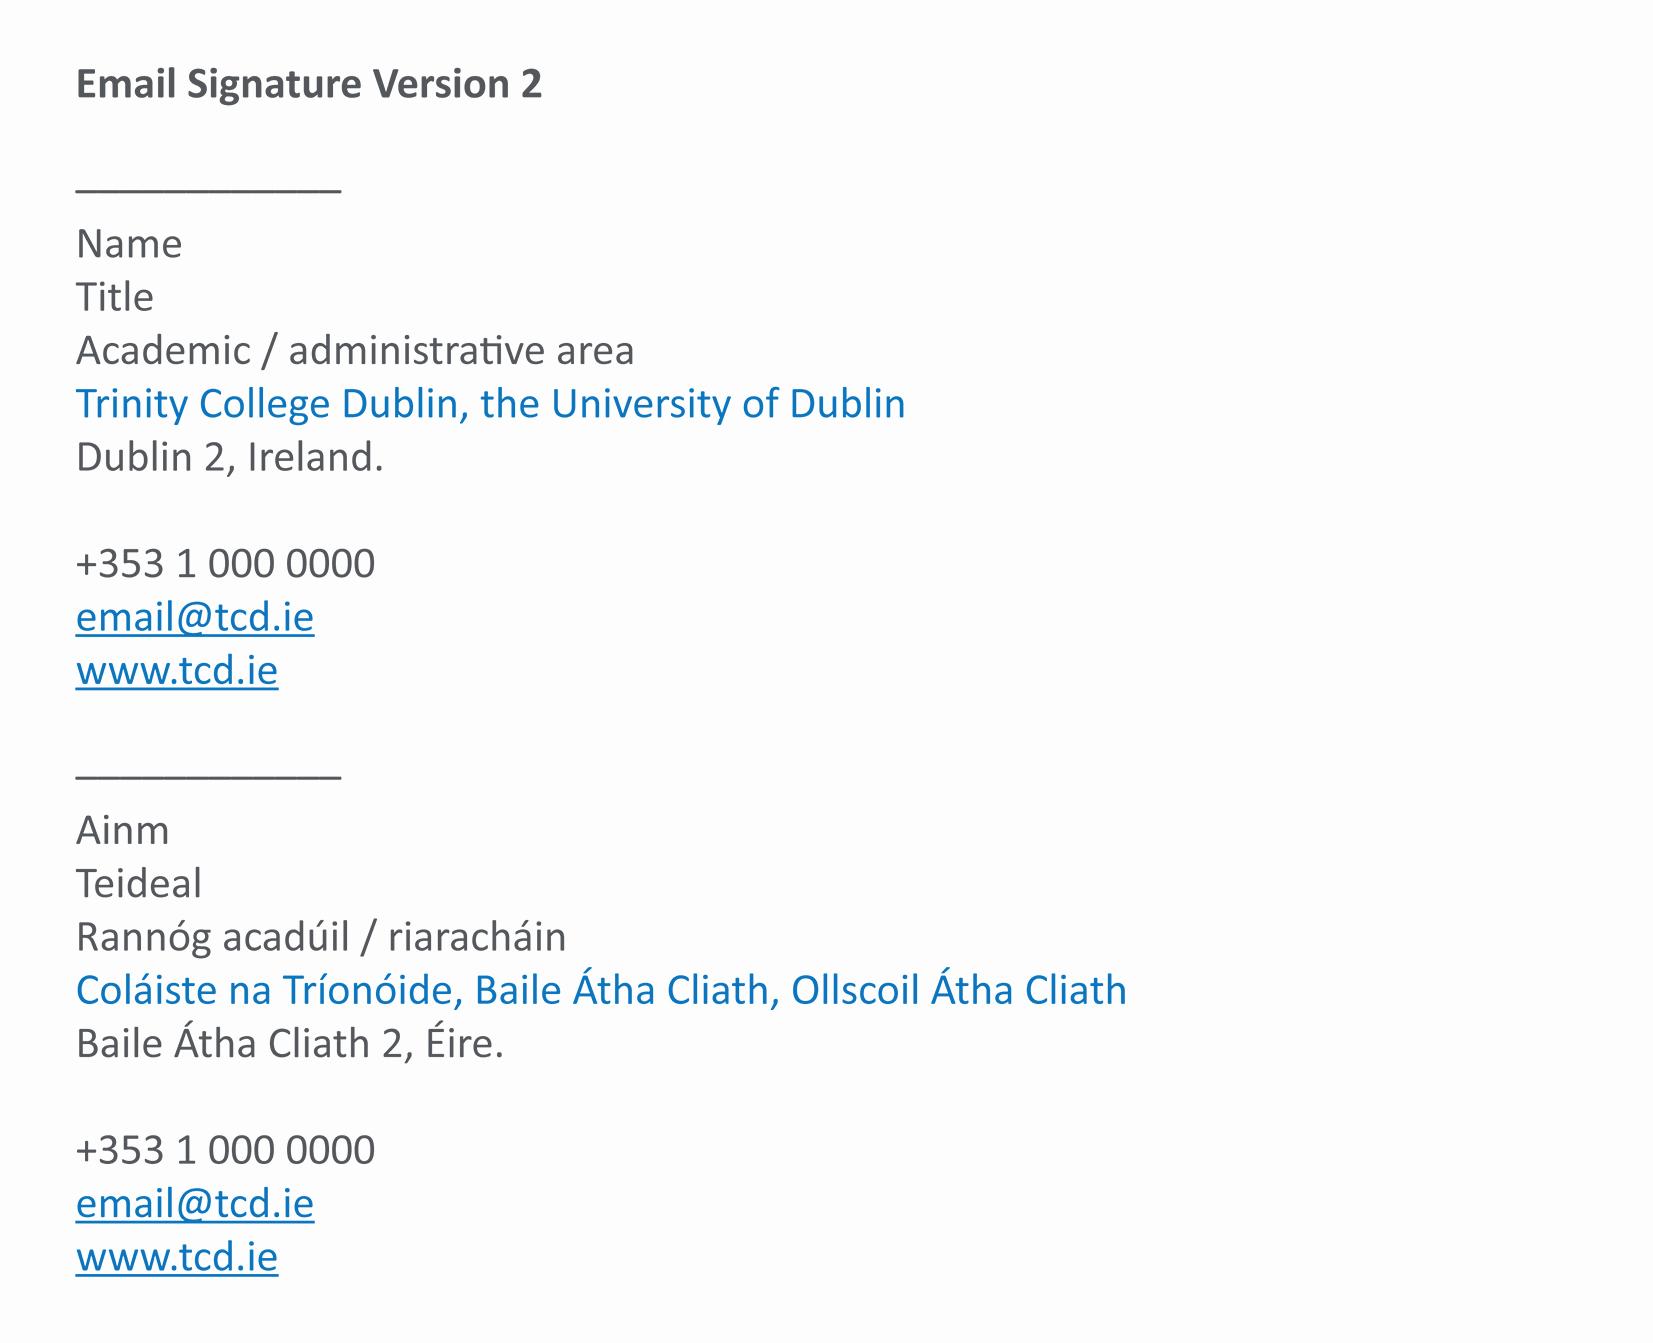 Professional Email Signature Student Unique Identity Trinity College Dublin